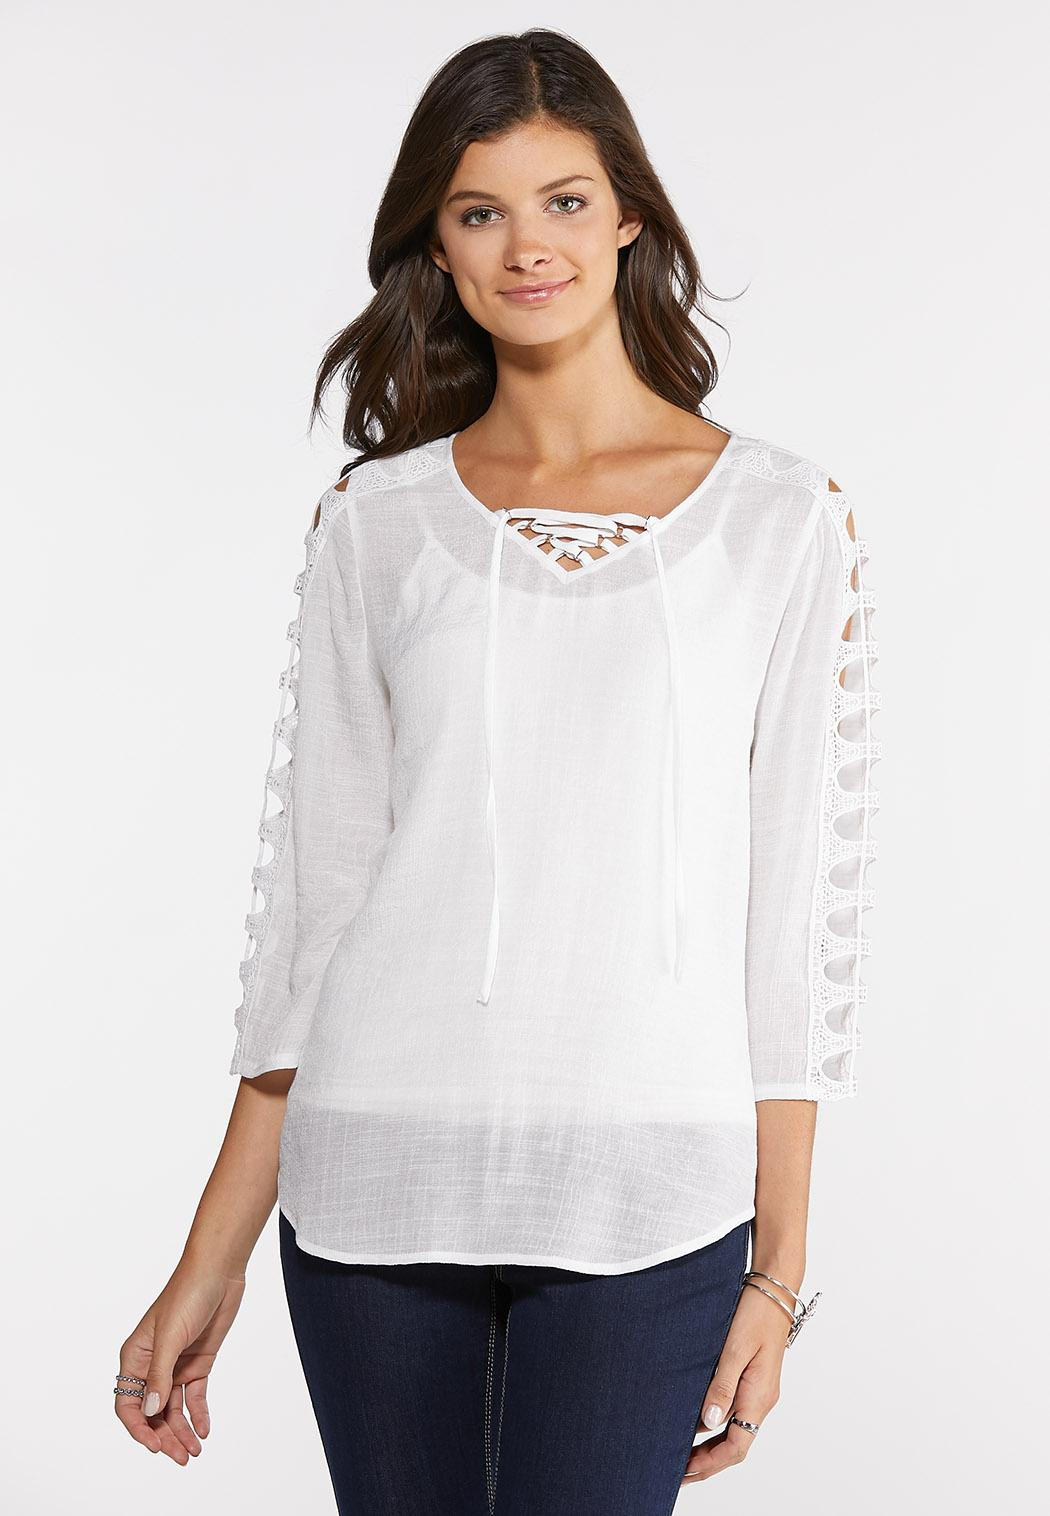 Crochet Cutout Sleeve Top